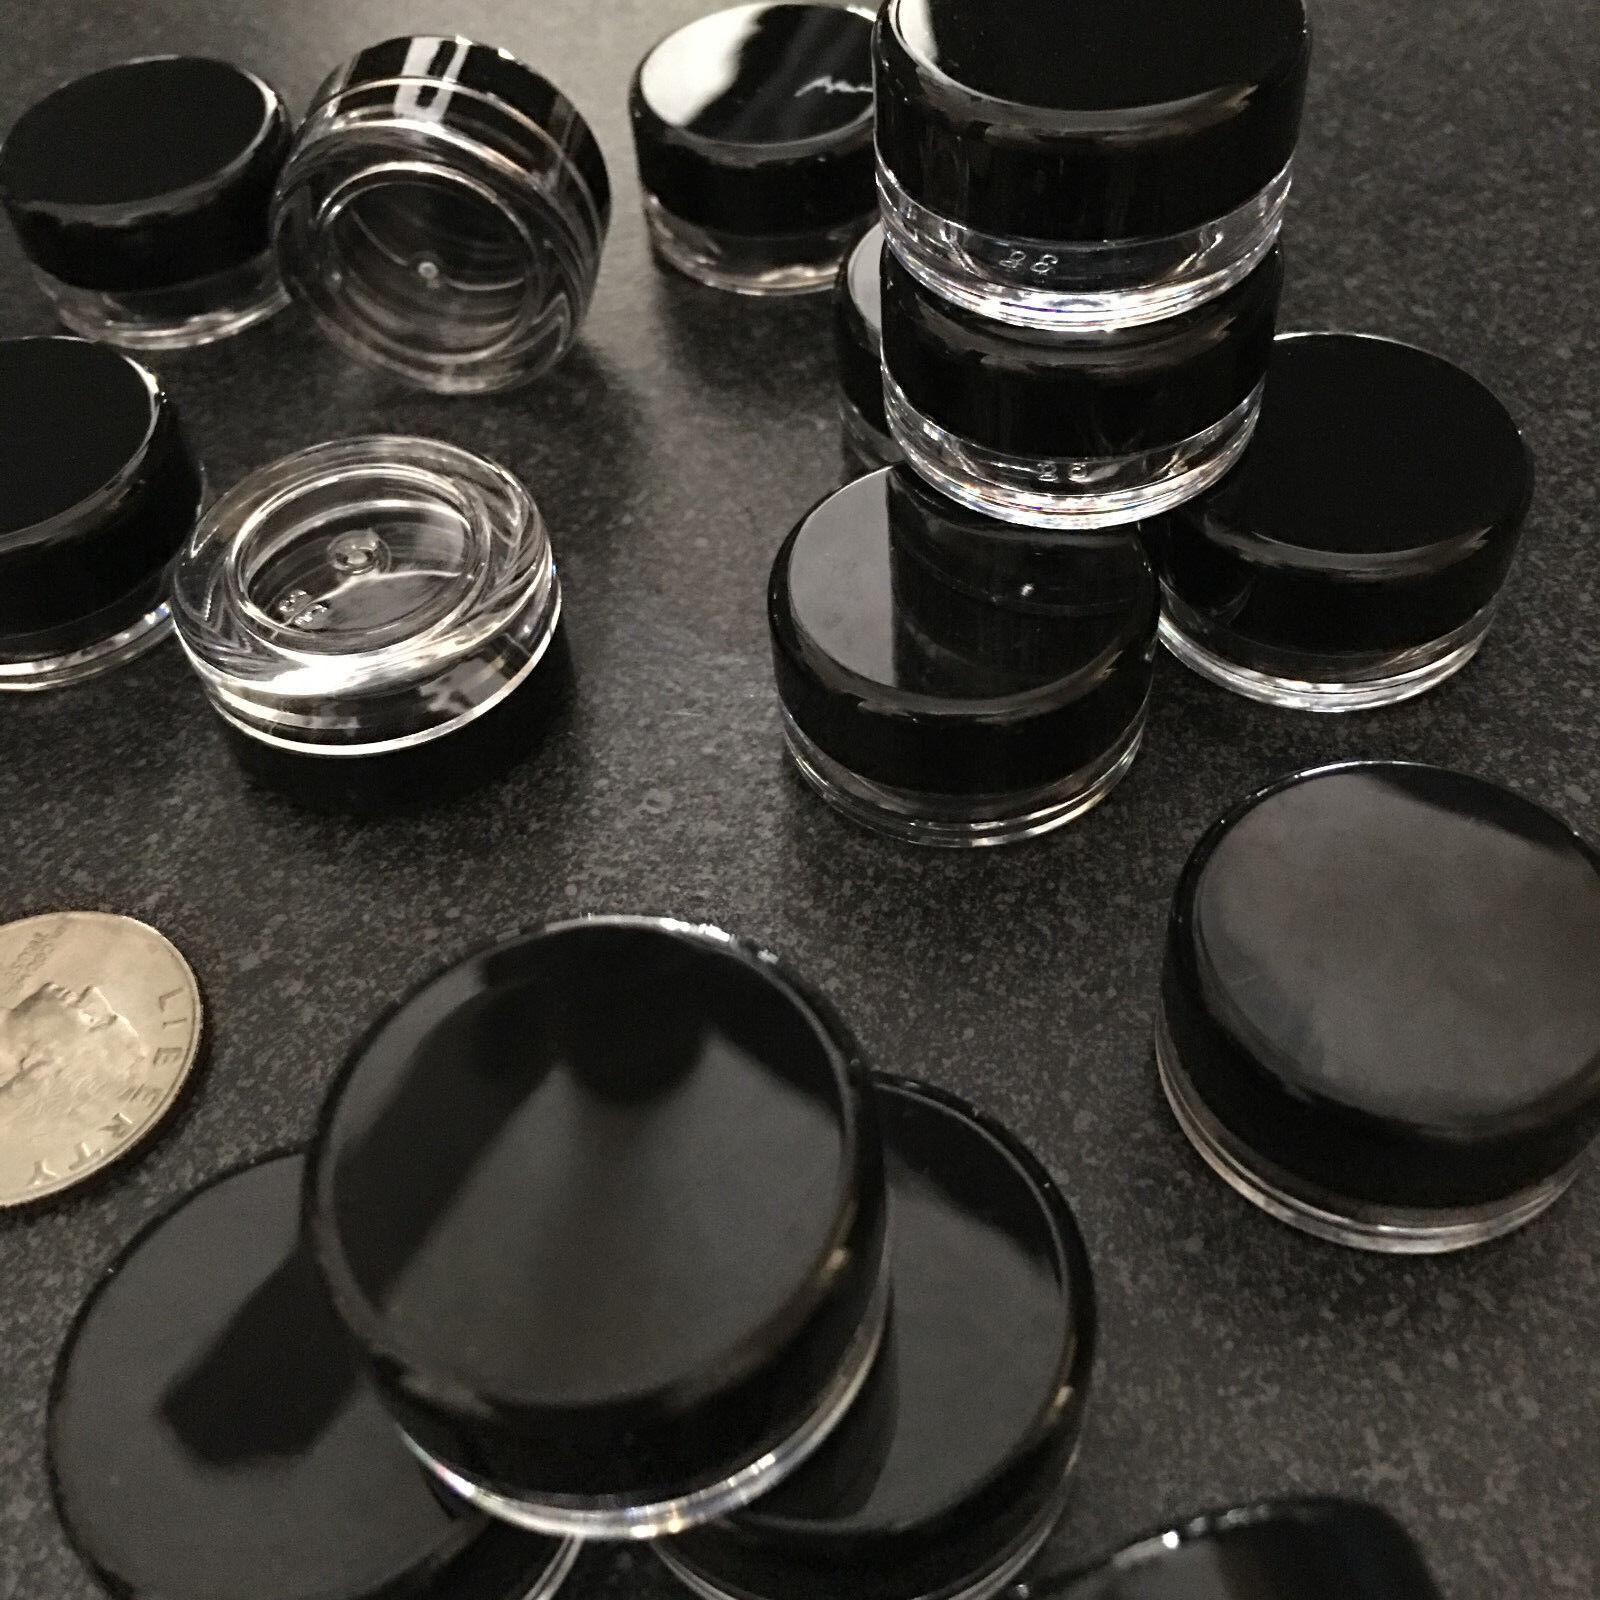 25 Lip Balm Pot Empty Cosmetic Jars Plastic Beauty Container